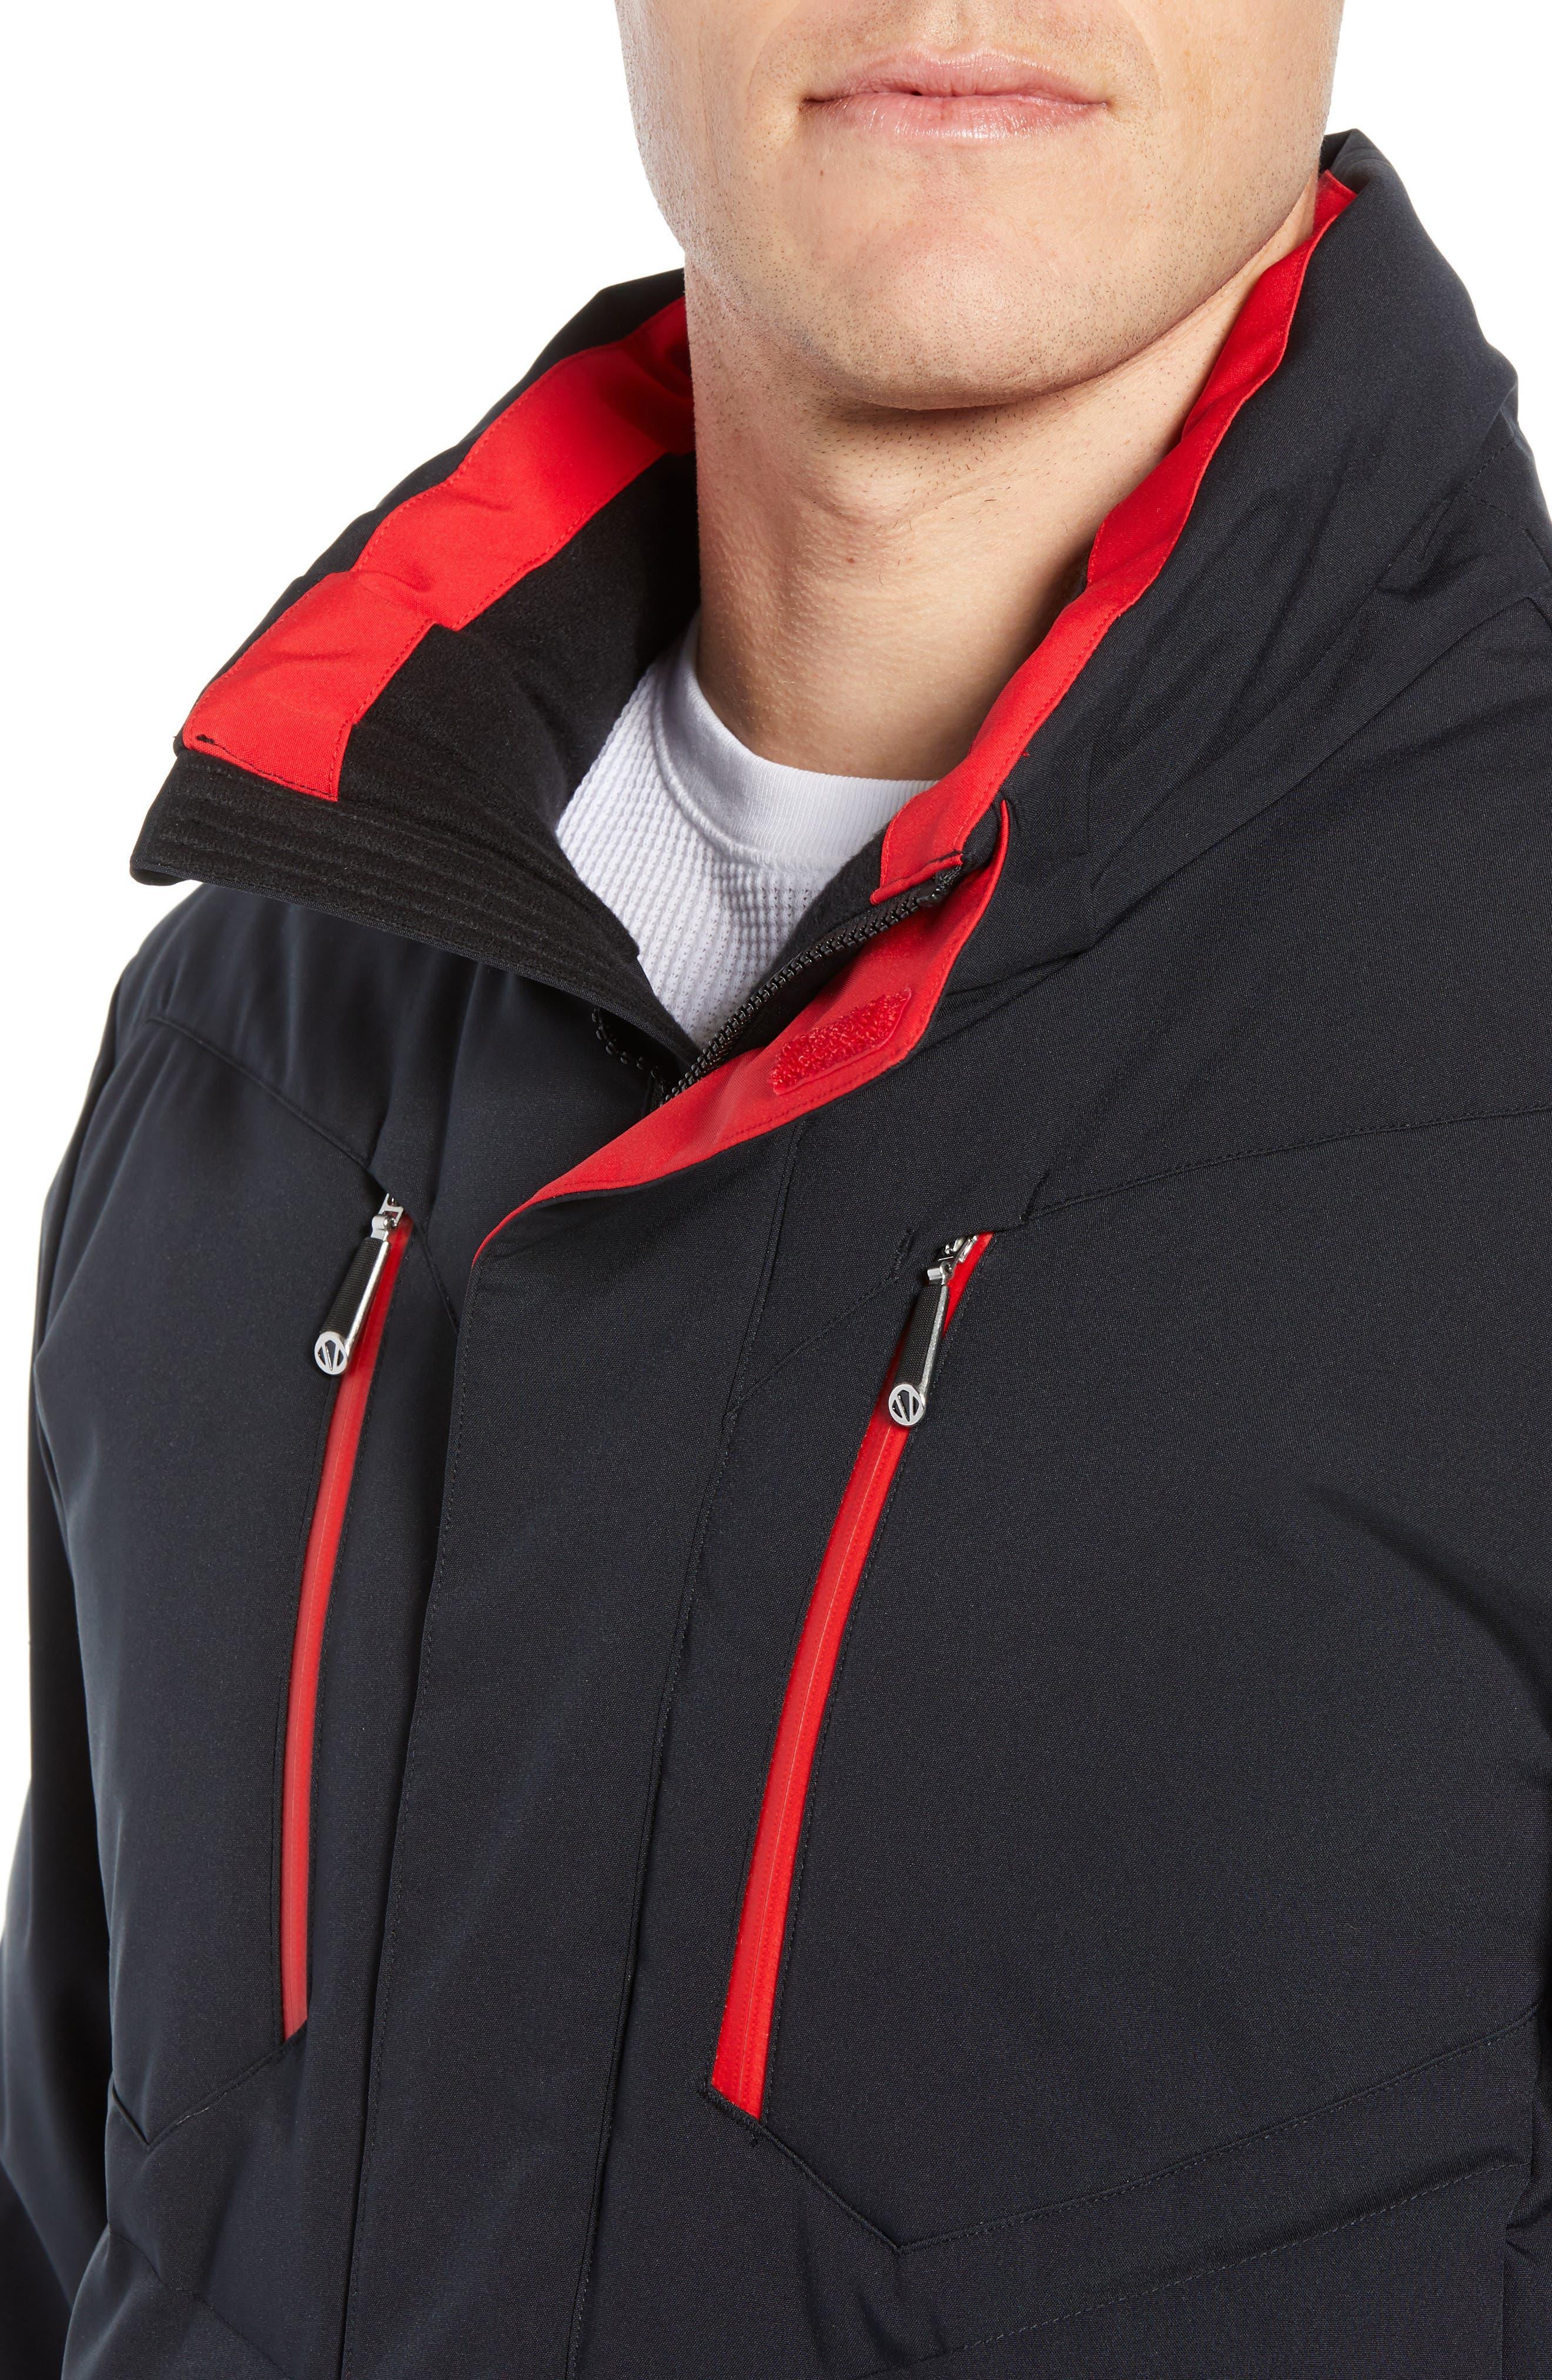 Boulder Waterproof Jacket,                             Alternate thumbnail 4, color,                             001